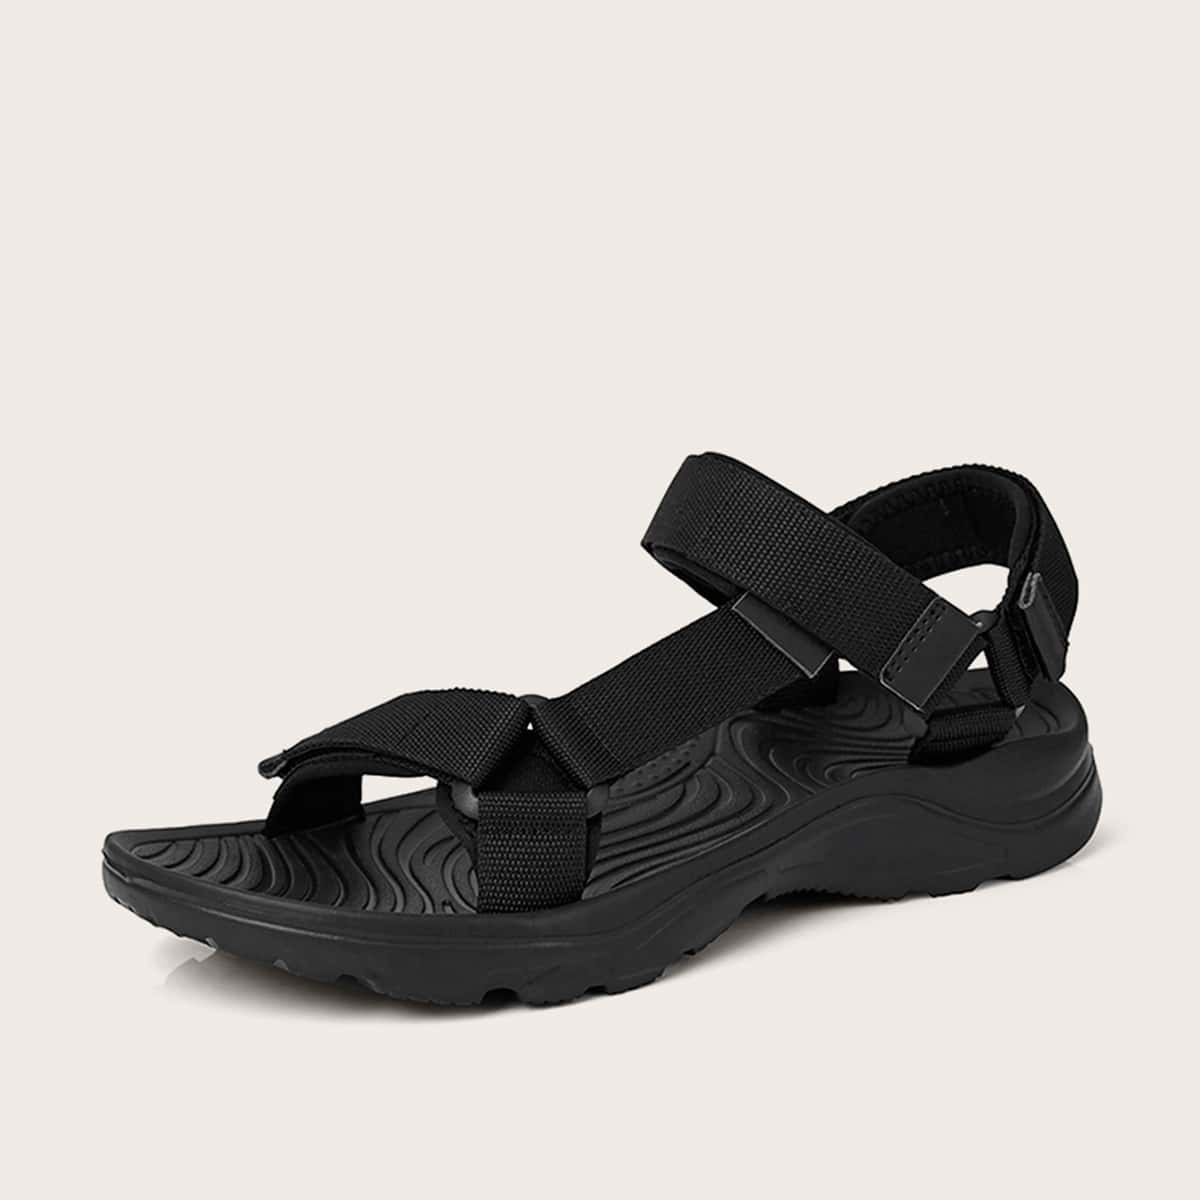 Heren Open teen antislip sandalen